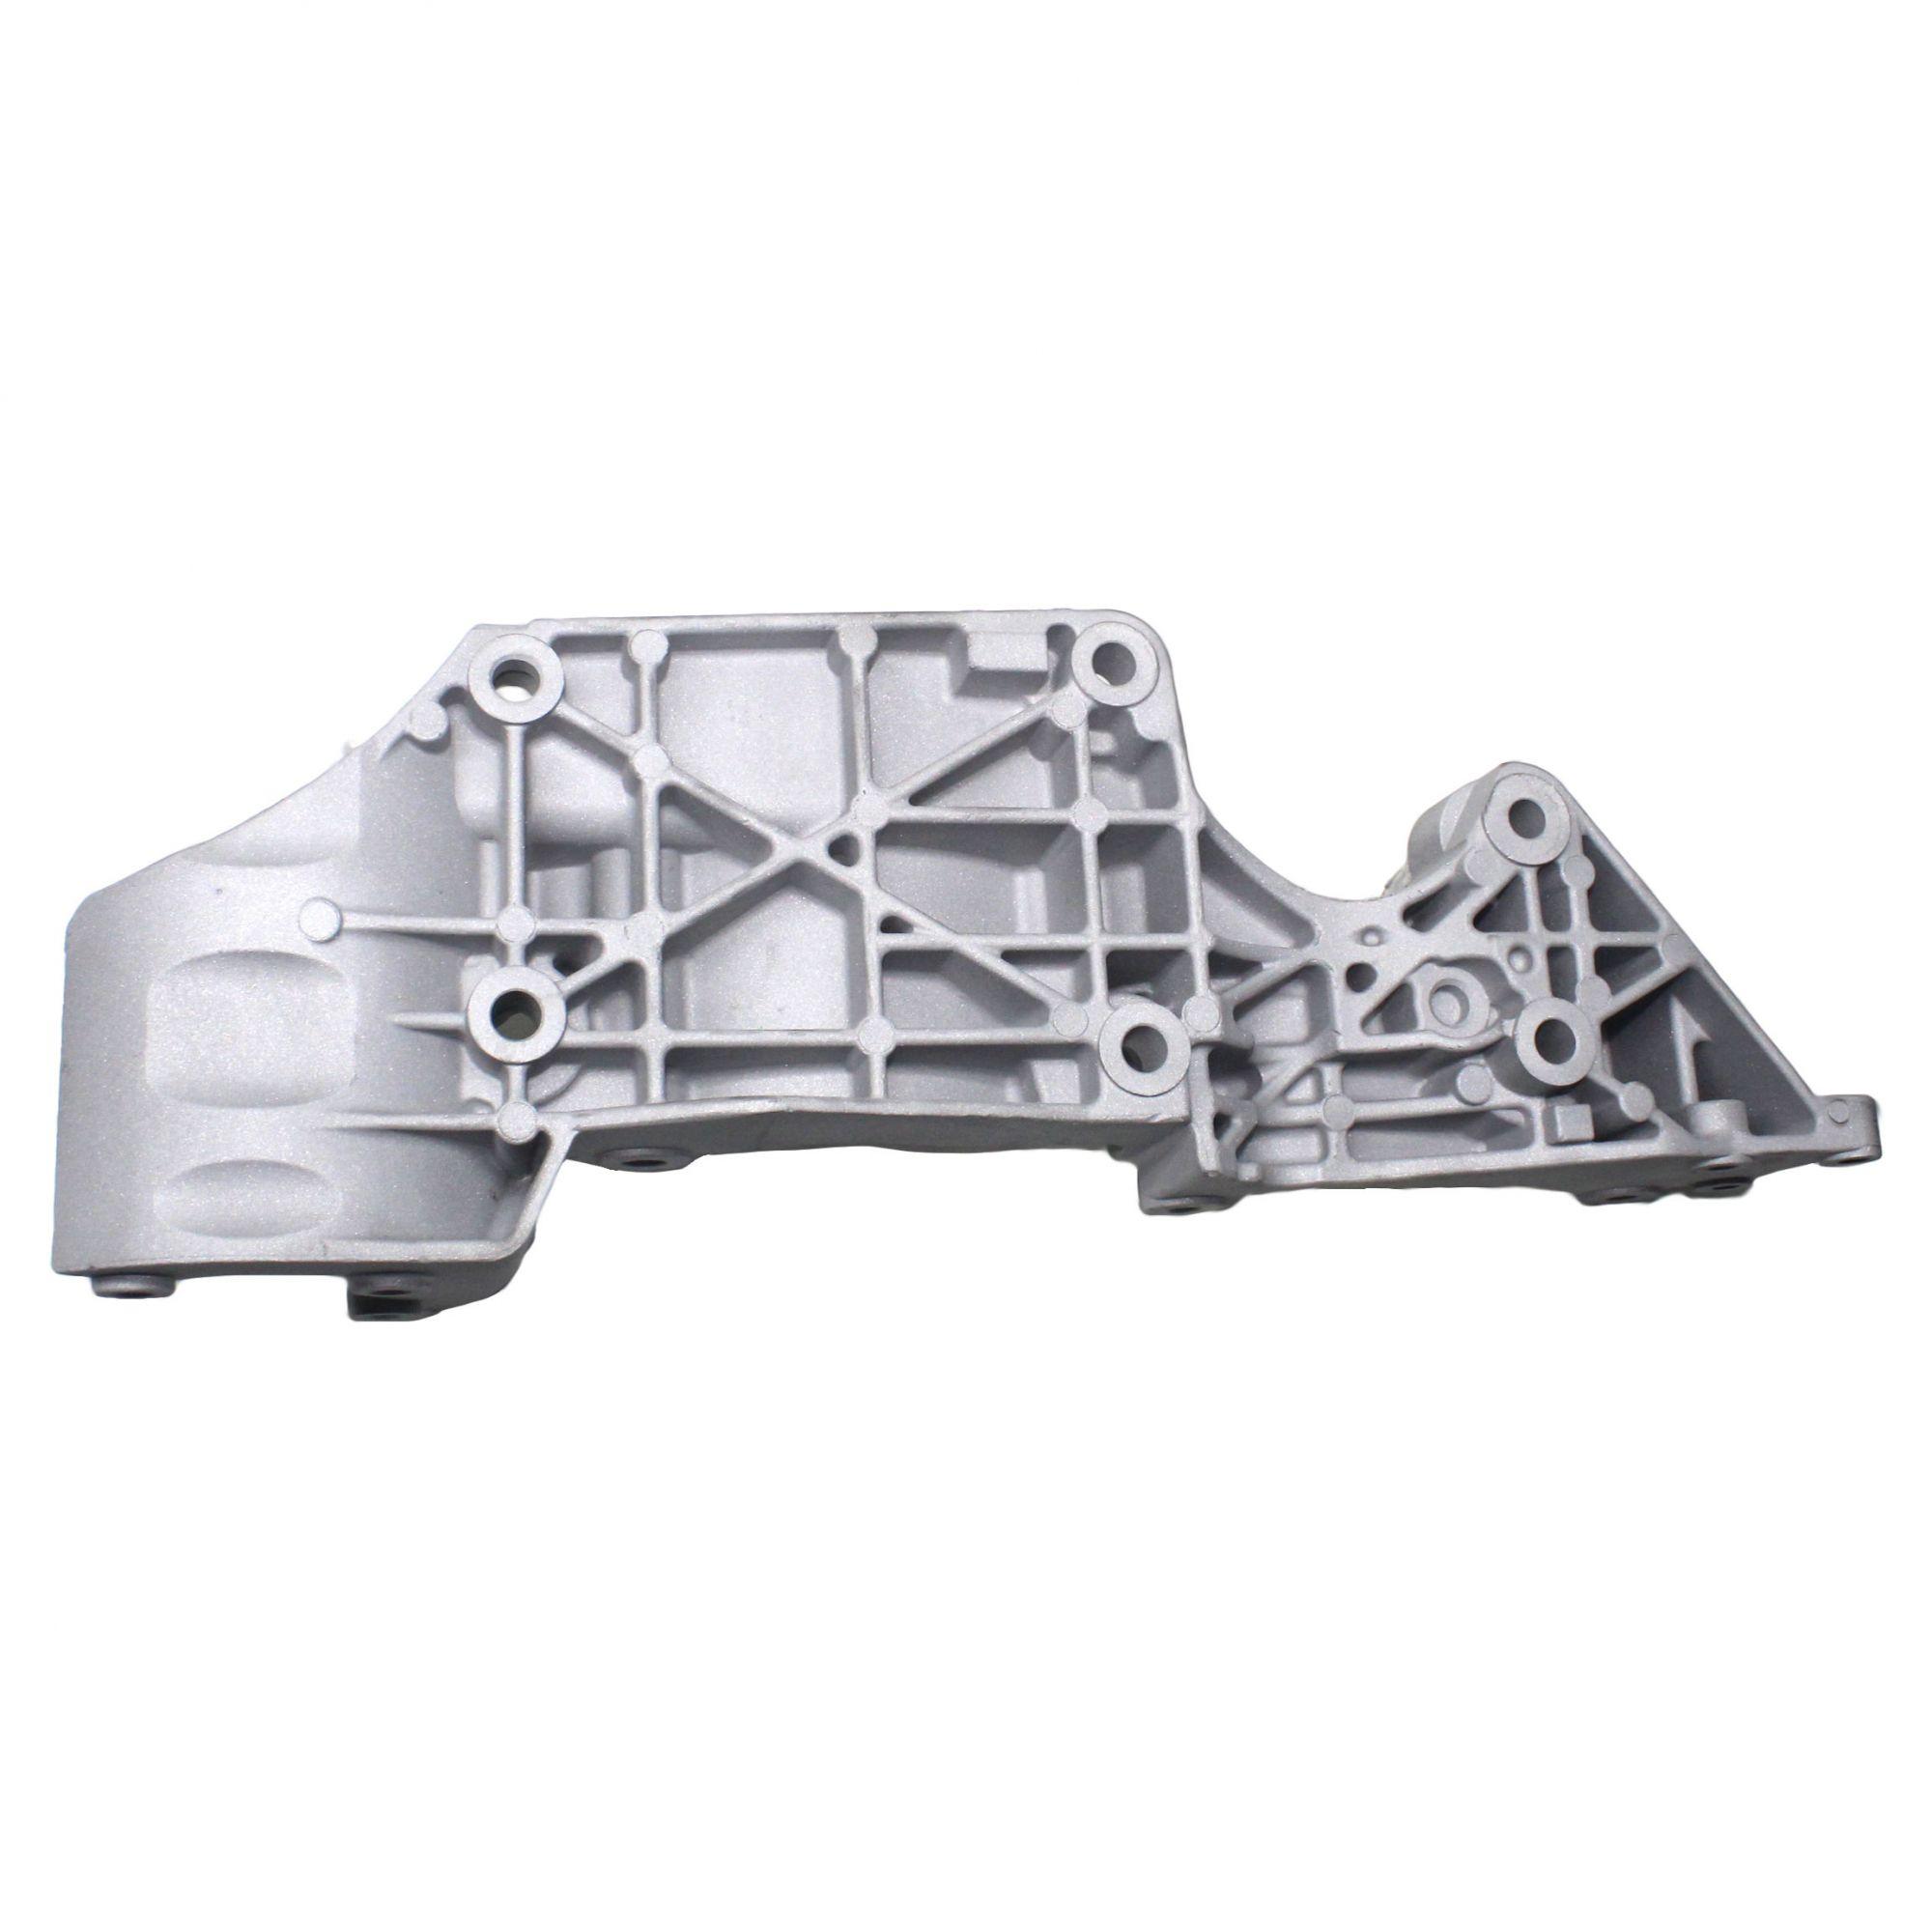 Suporte Bomba Hidráulica Audi A3 Vw Golf 1.6 06a903143p